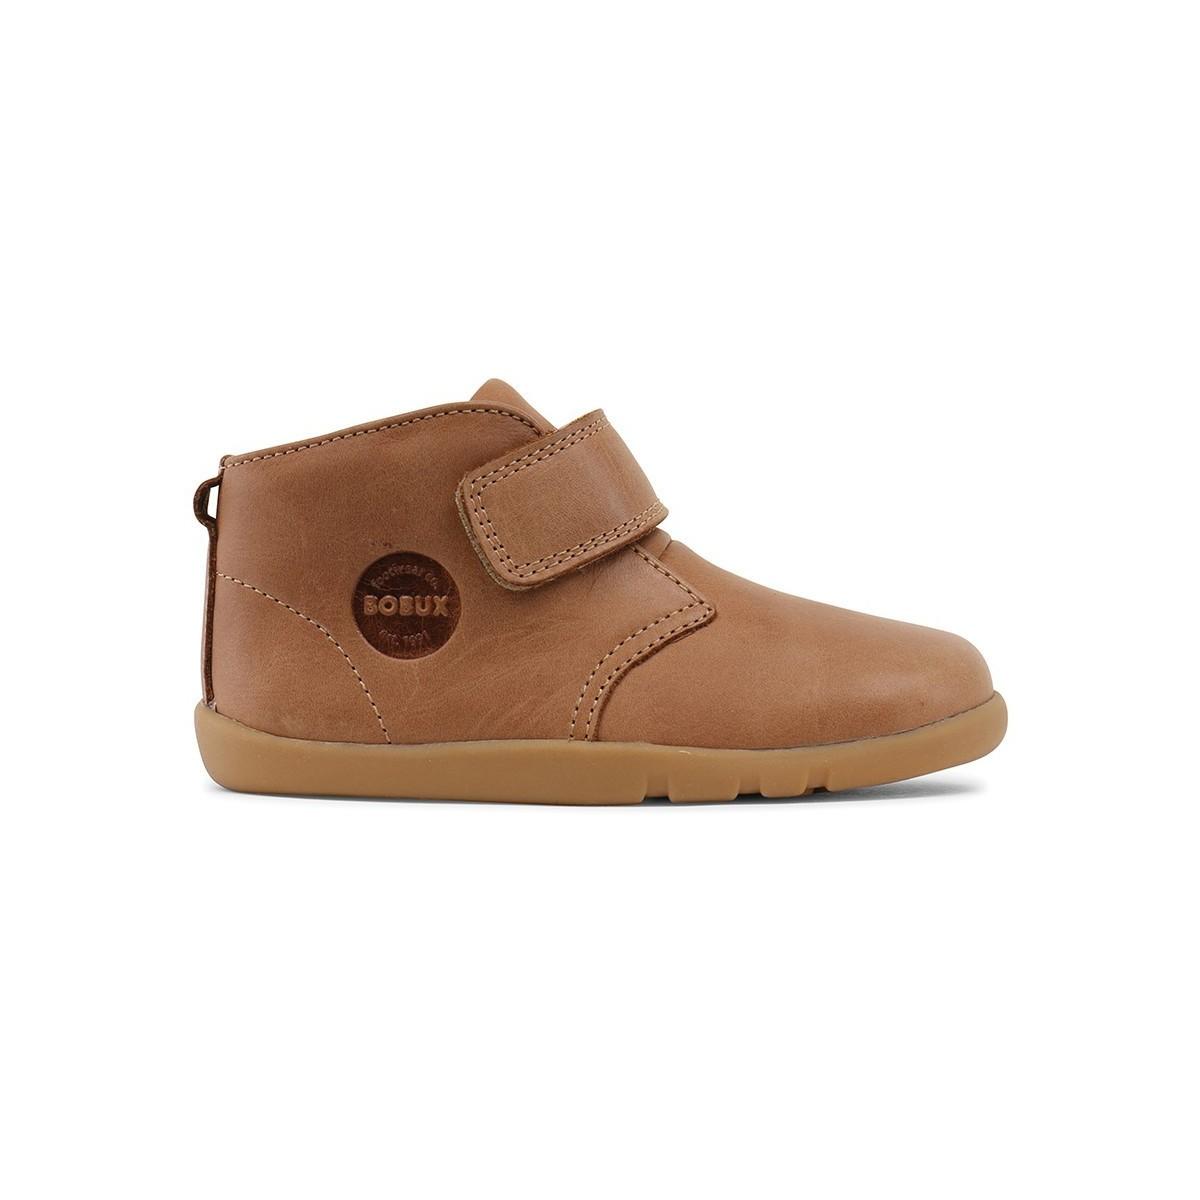 Chaussures velcro cuir beige